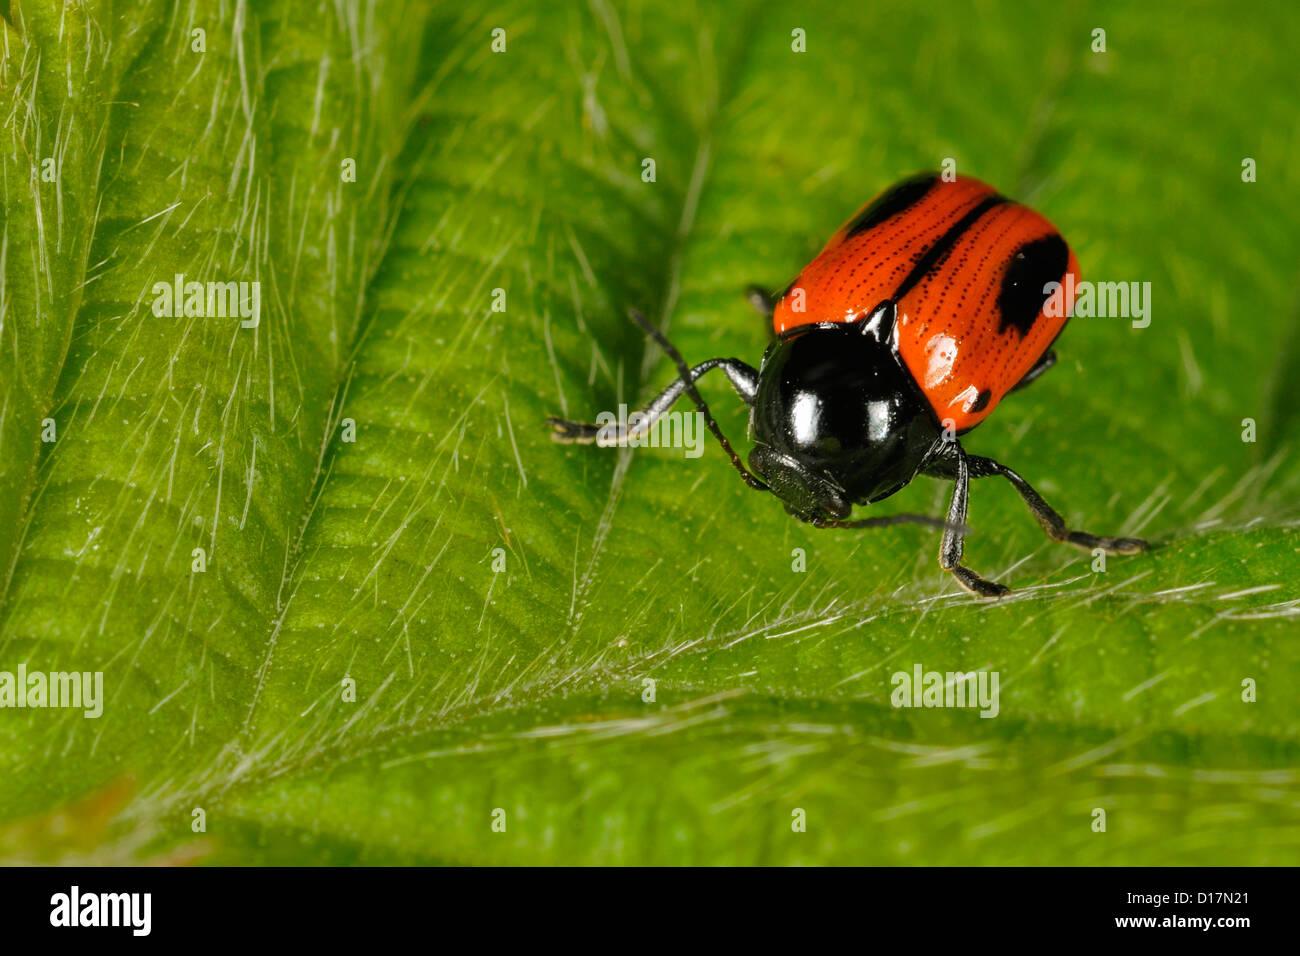 Four-spotted leaf beetle stalk Clytra laeviuscula, Crisomelidae, Campaegli, Monti Simbruini regional Park, Lazio, - Stock Image